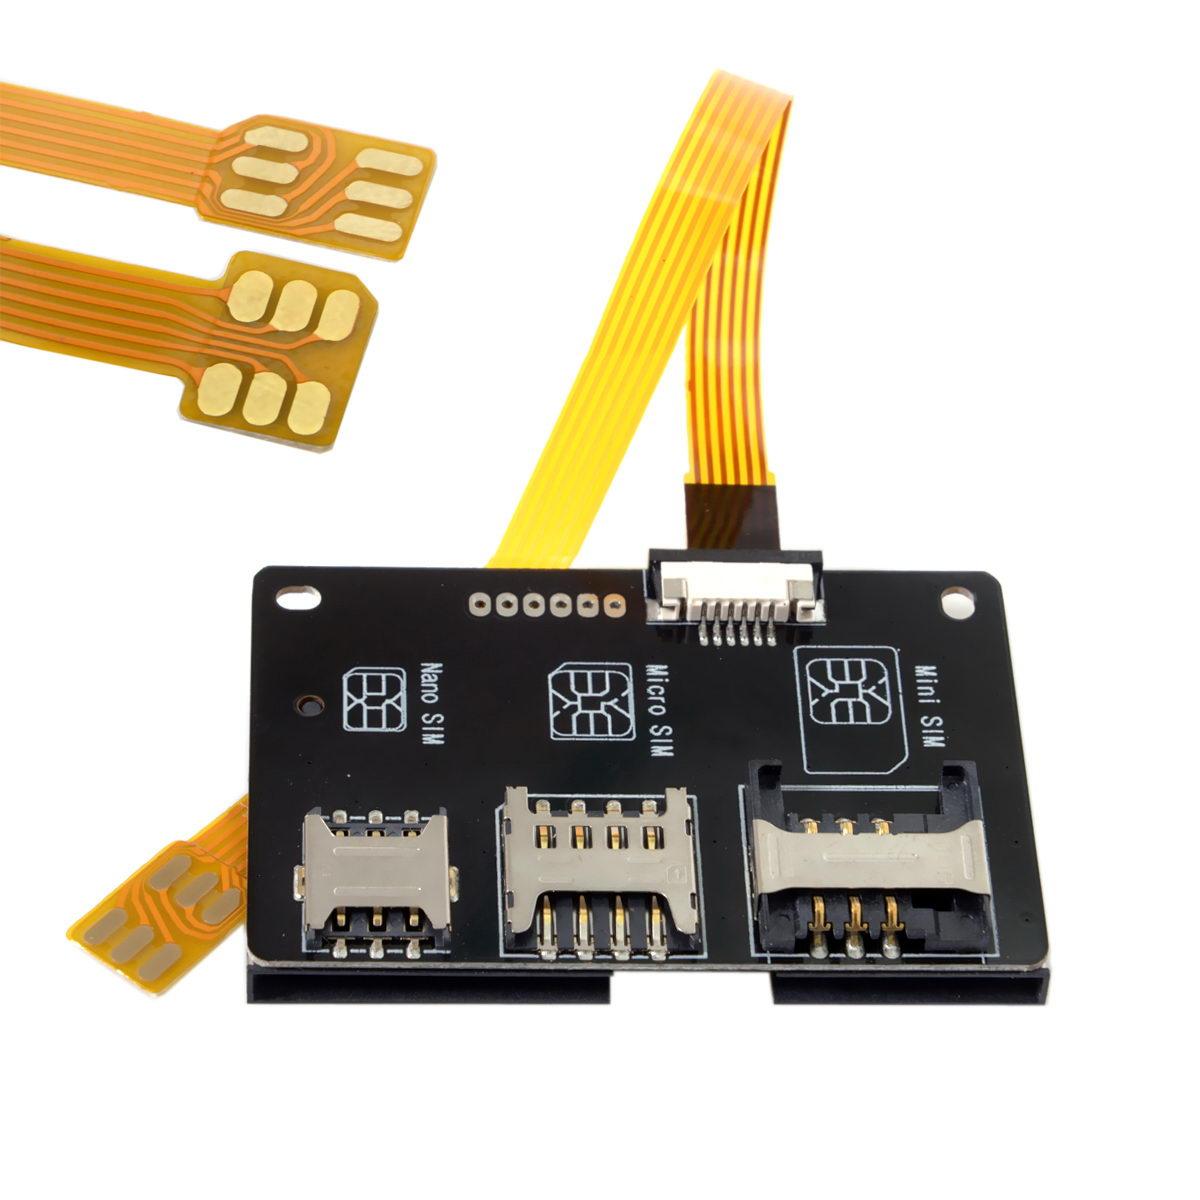 10pcs/lot  Nano SIM Activation Tools Converter to Smartcard IC Card Extension for Micro & Nano SIM Card Adapter Kit